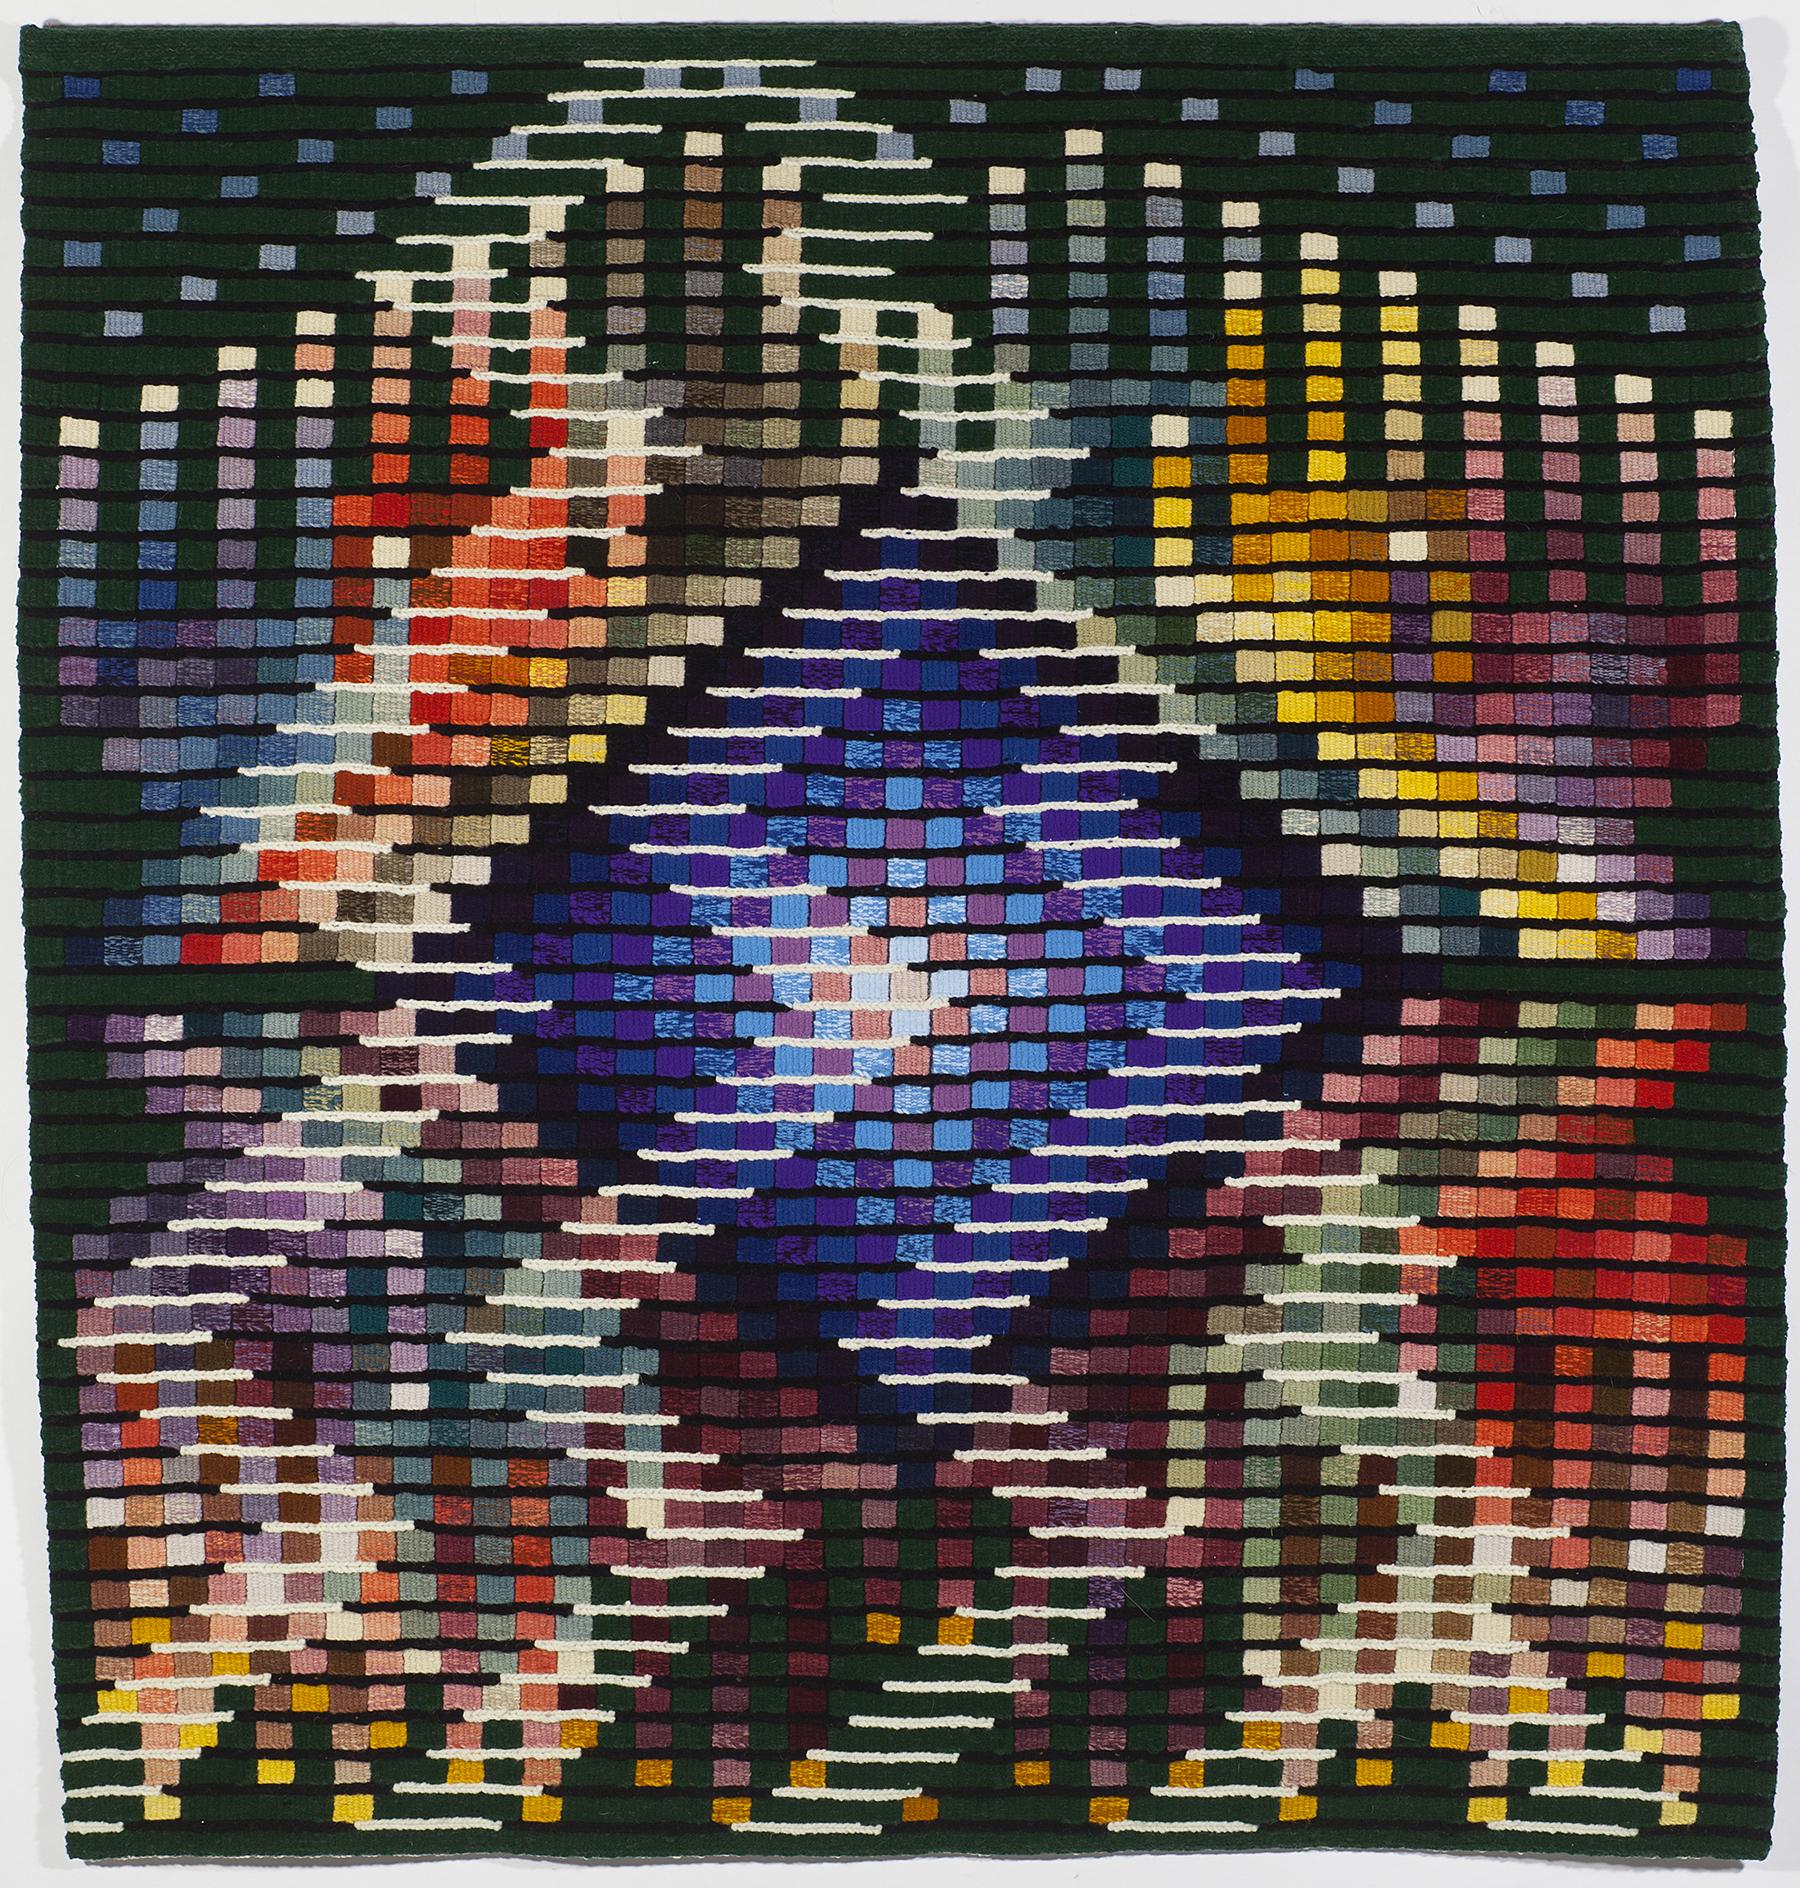 David Johnson - D. Johnson 2015 Universal Prayer Rug.jpg